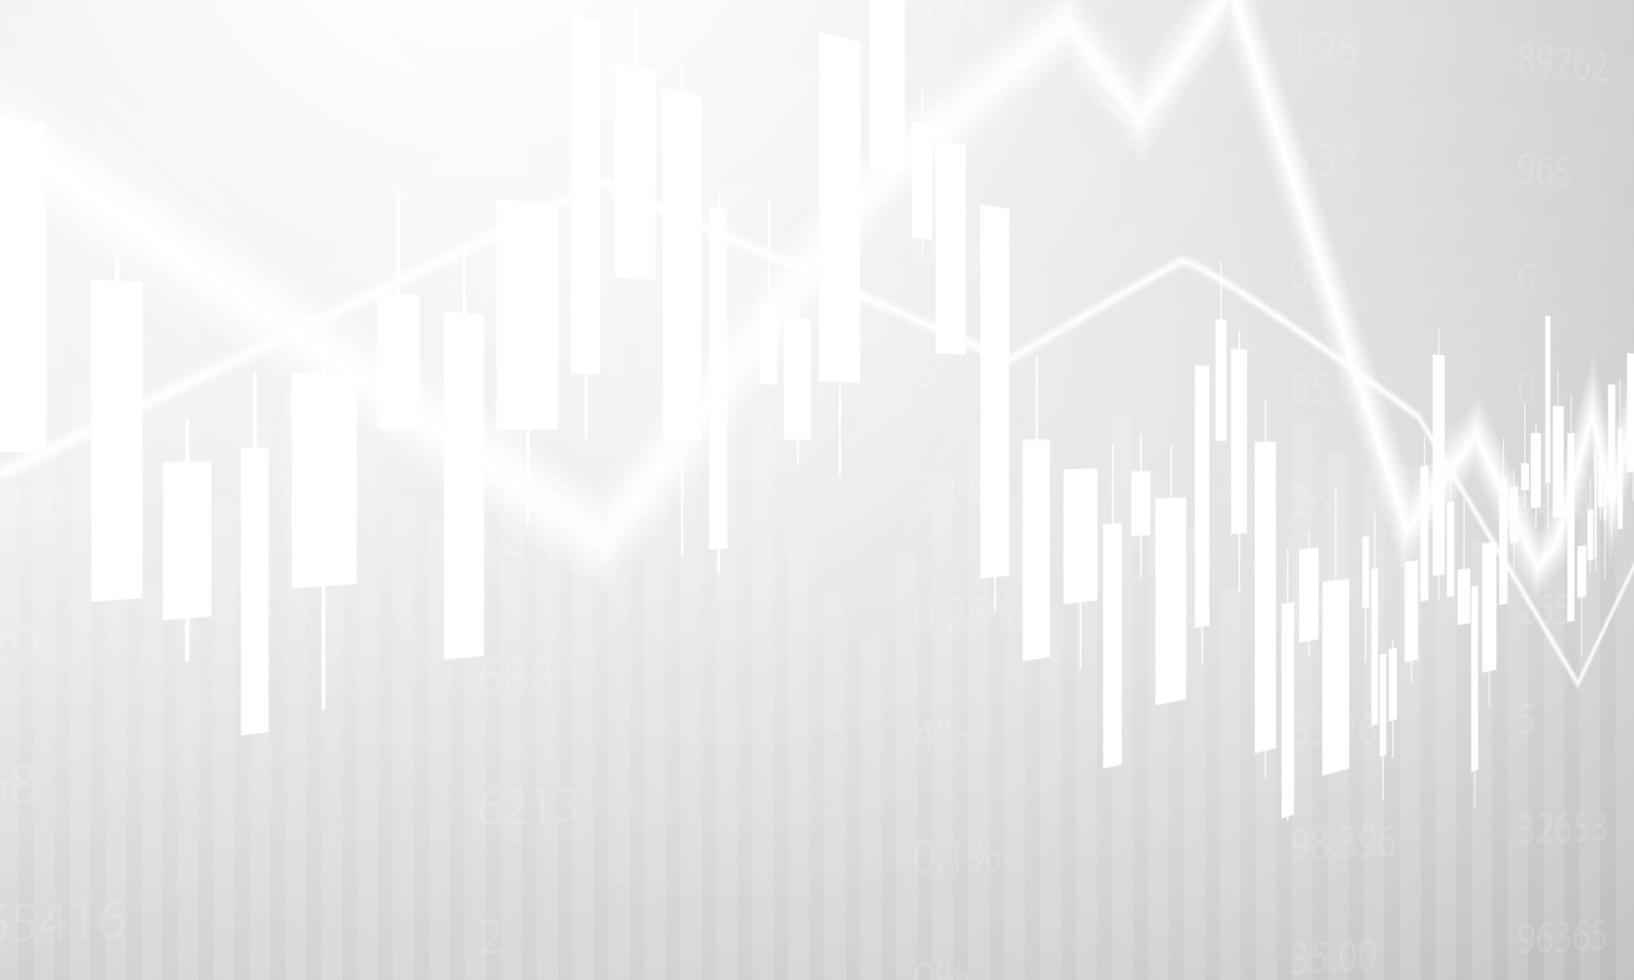 Stock market graph design on white background  vector